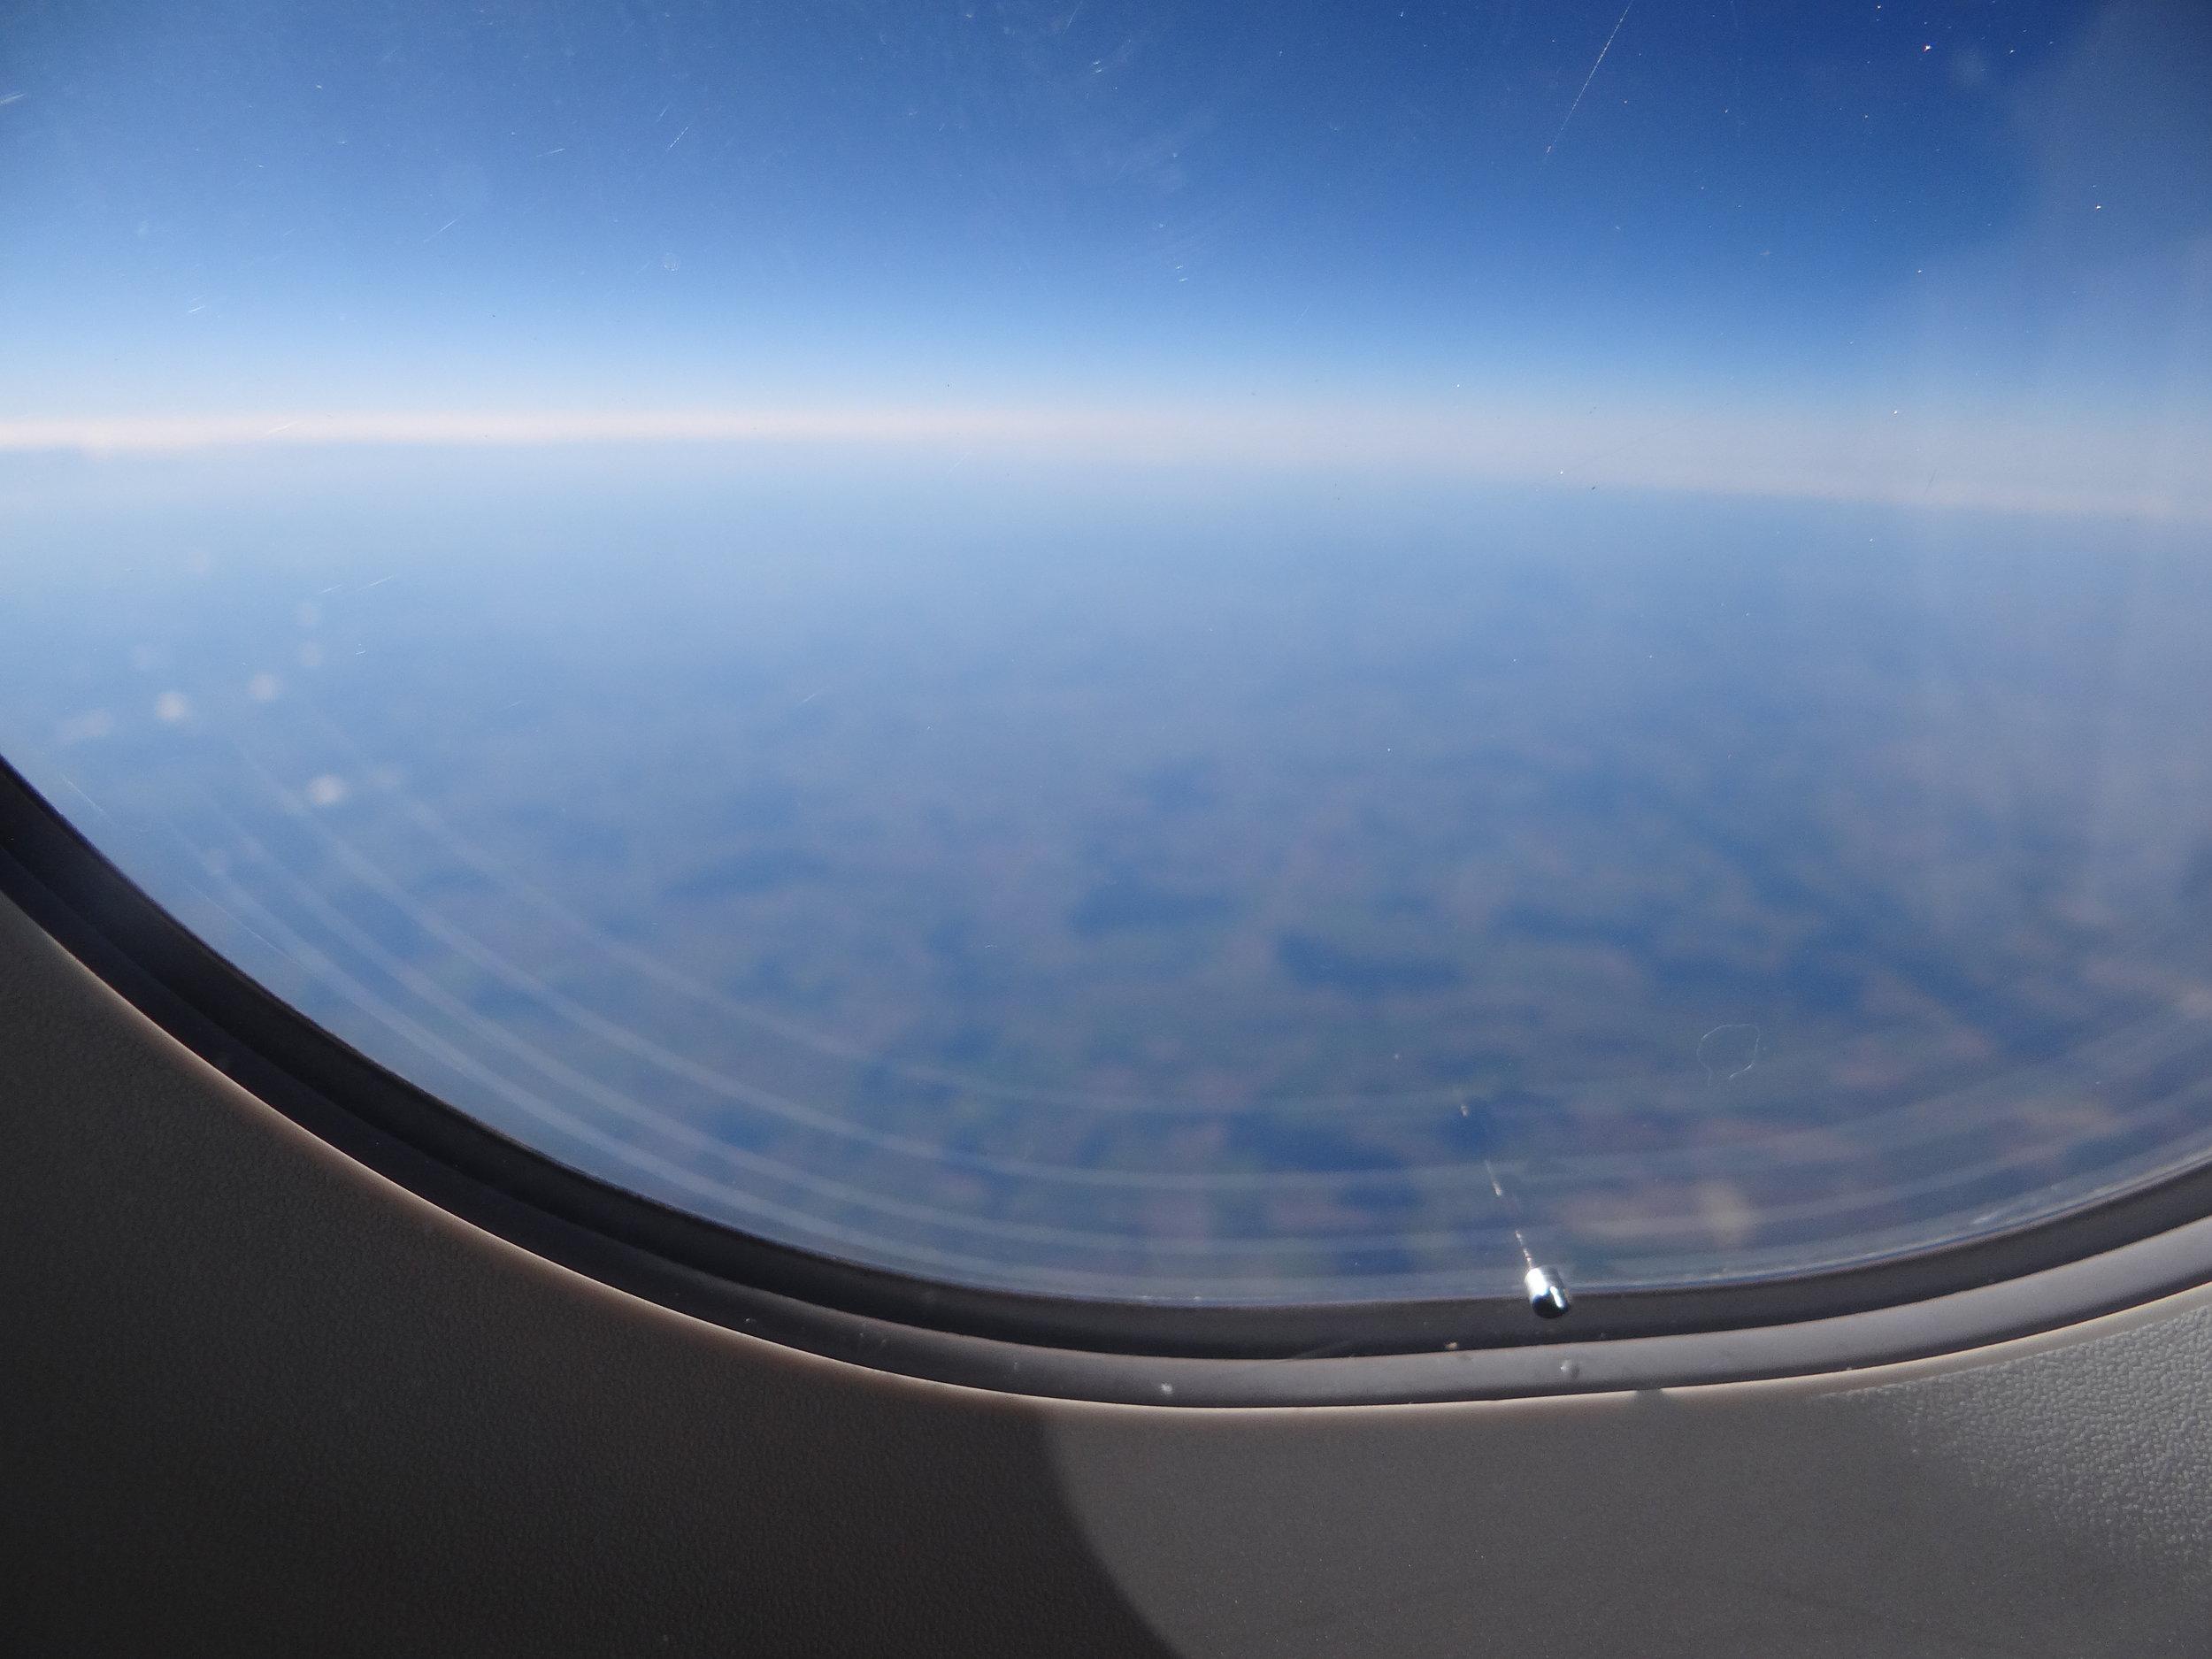 Somewhere over Belarus...